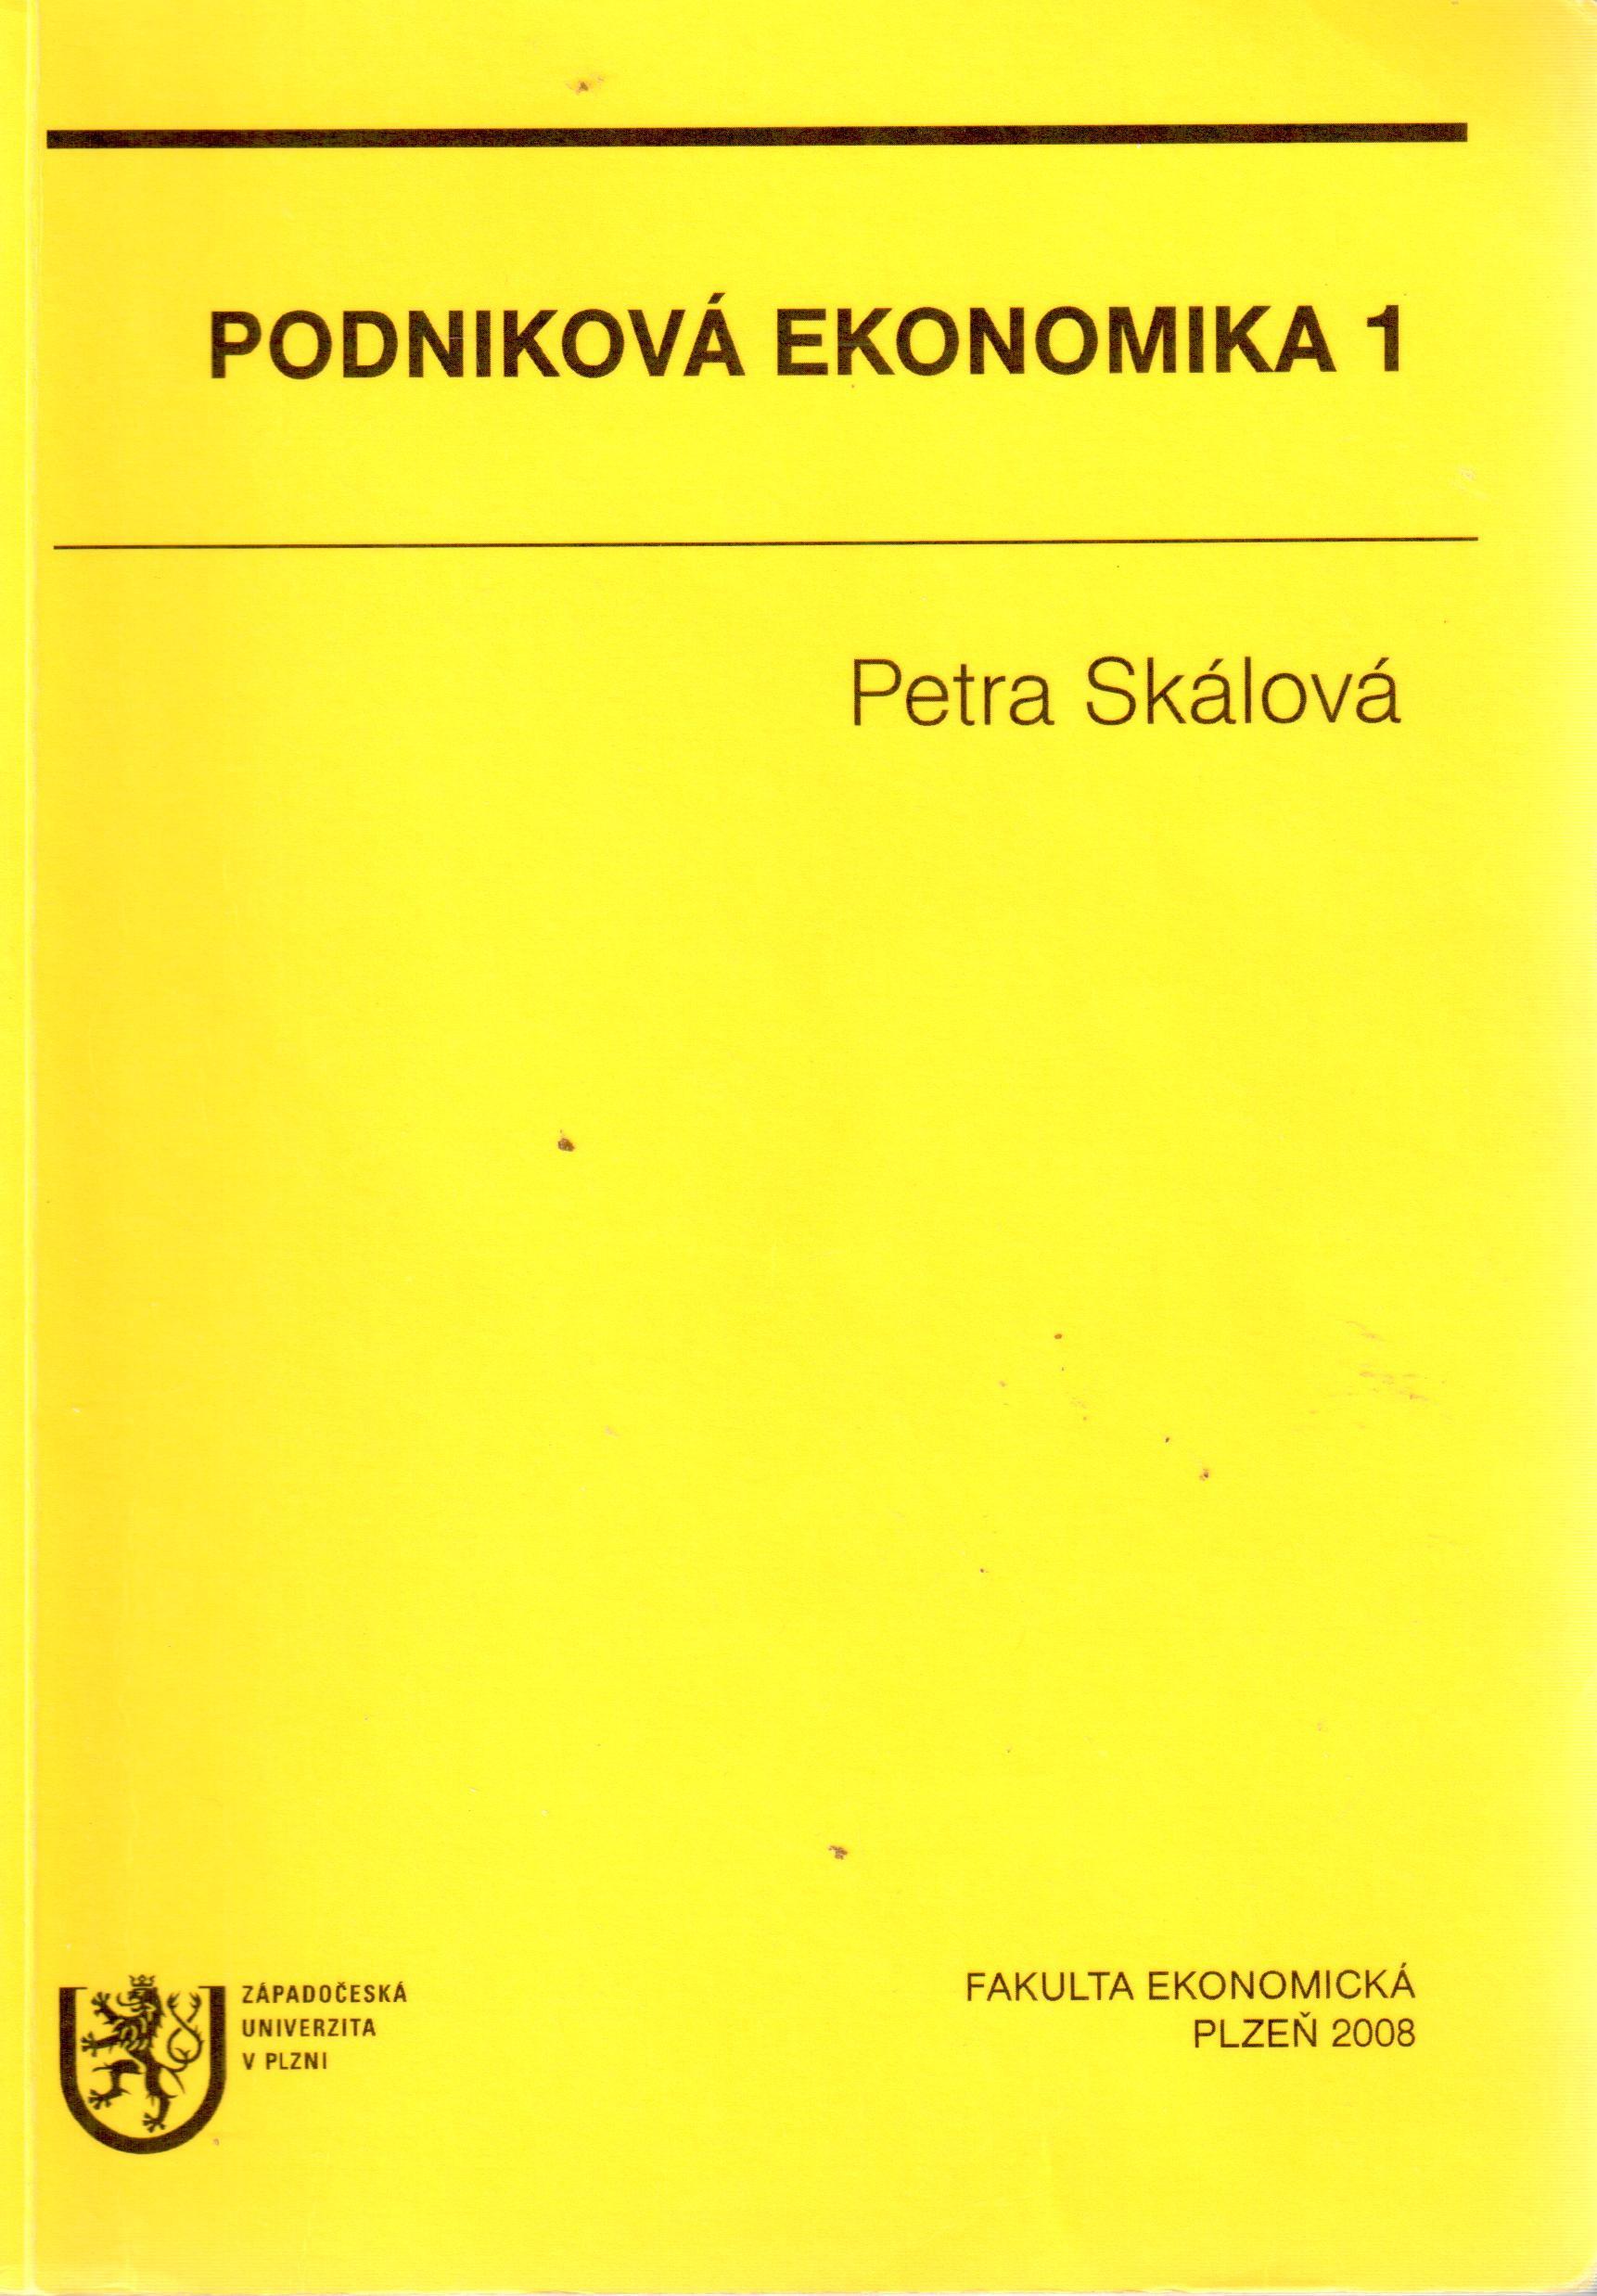 Podniková ekonomika 1 - Náhled učebnice